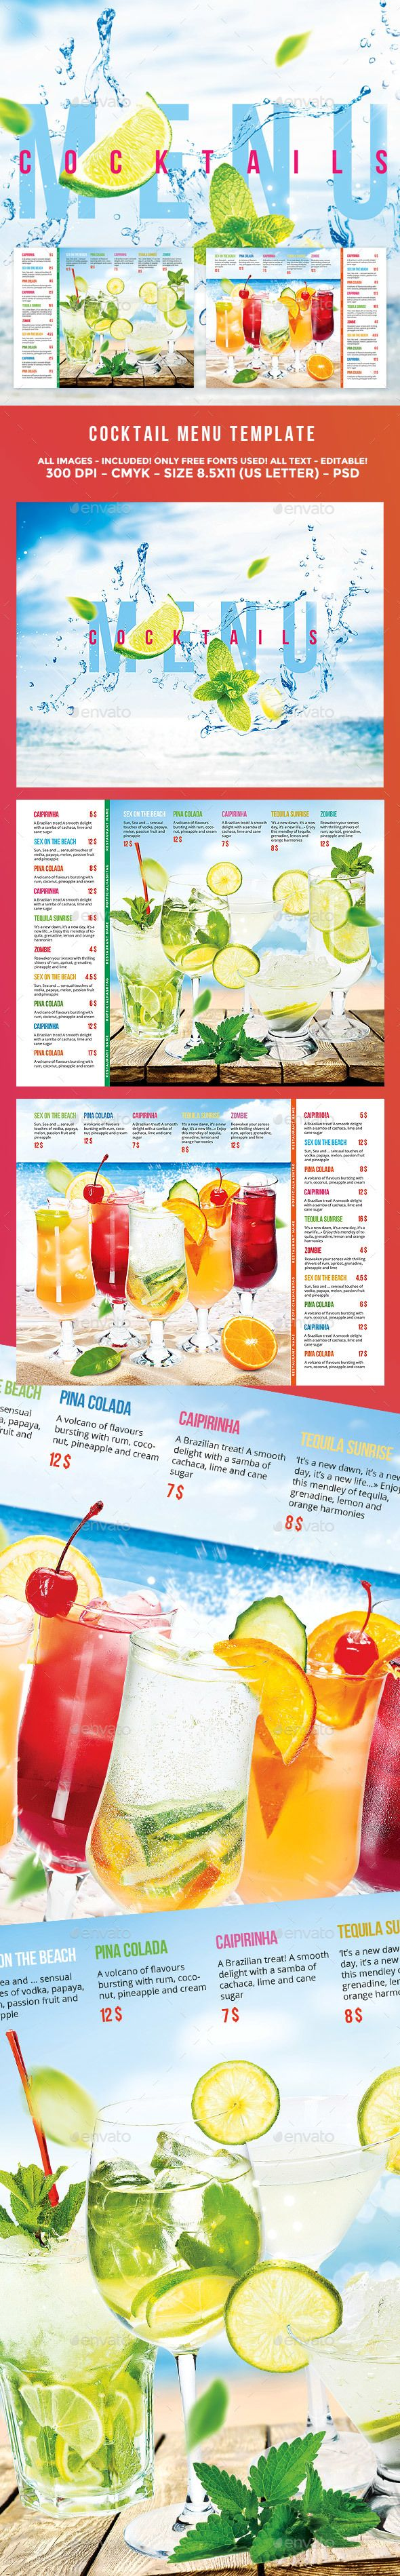 14 Best Images About Menu Book Inspritation On Pinterest  B86b07aeb874d16606badbd9abc7f10e Menu Book Inspritation Cocktail Menu  Template Free Download  Cocktail Menu Template Free Download